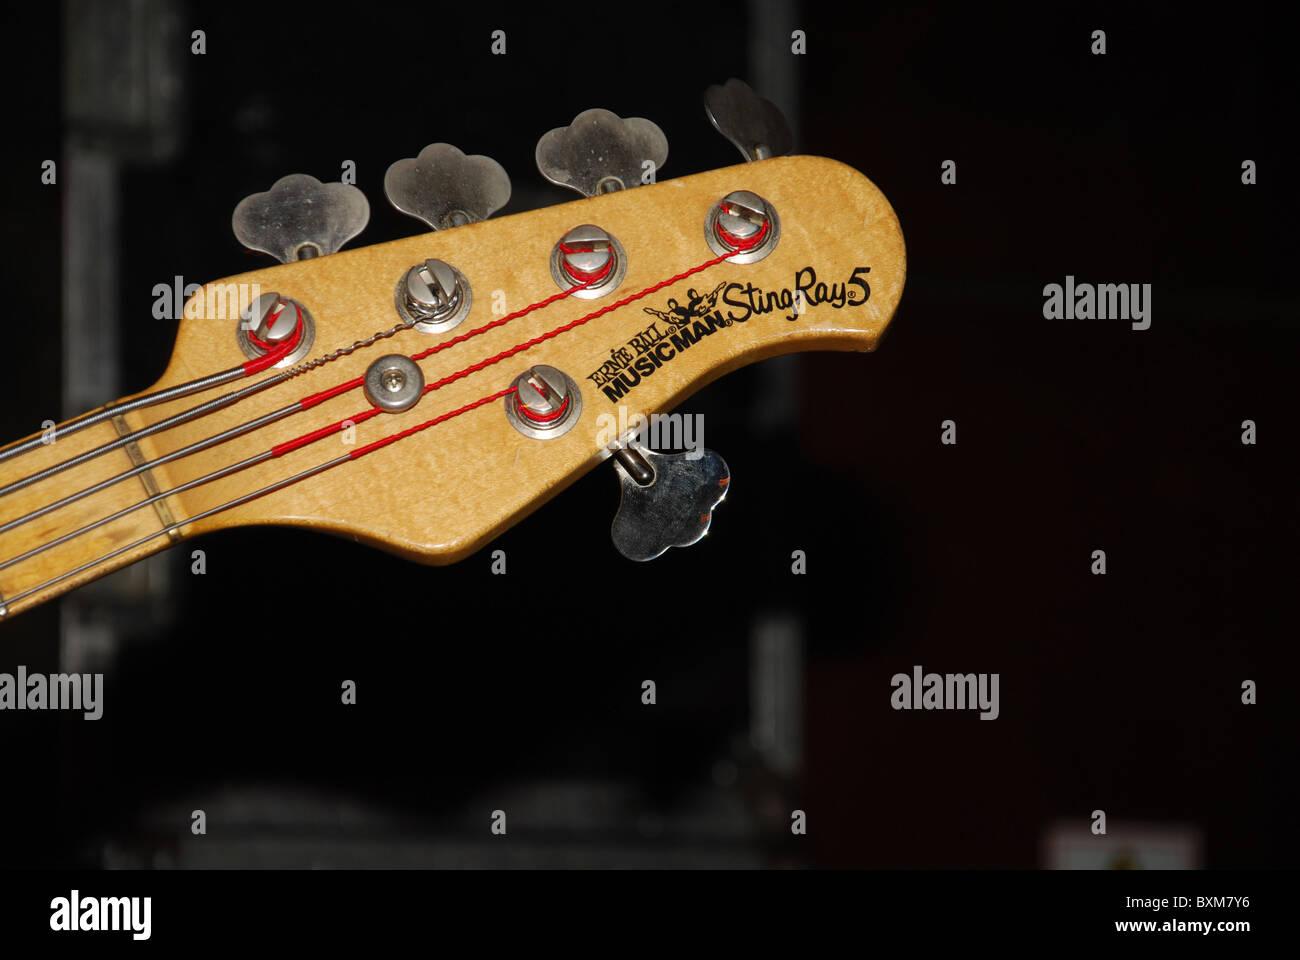 musicman stock photos musicman stock images alamy. Black Bedroom Furniture Sets. Home Design Ideas